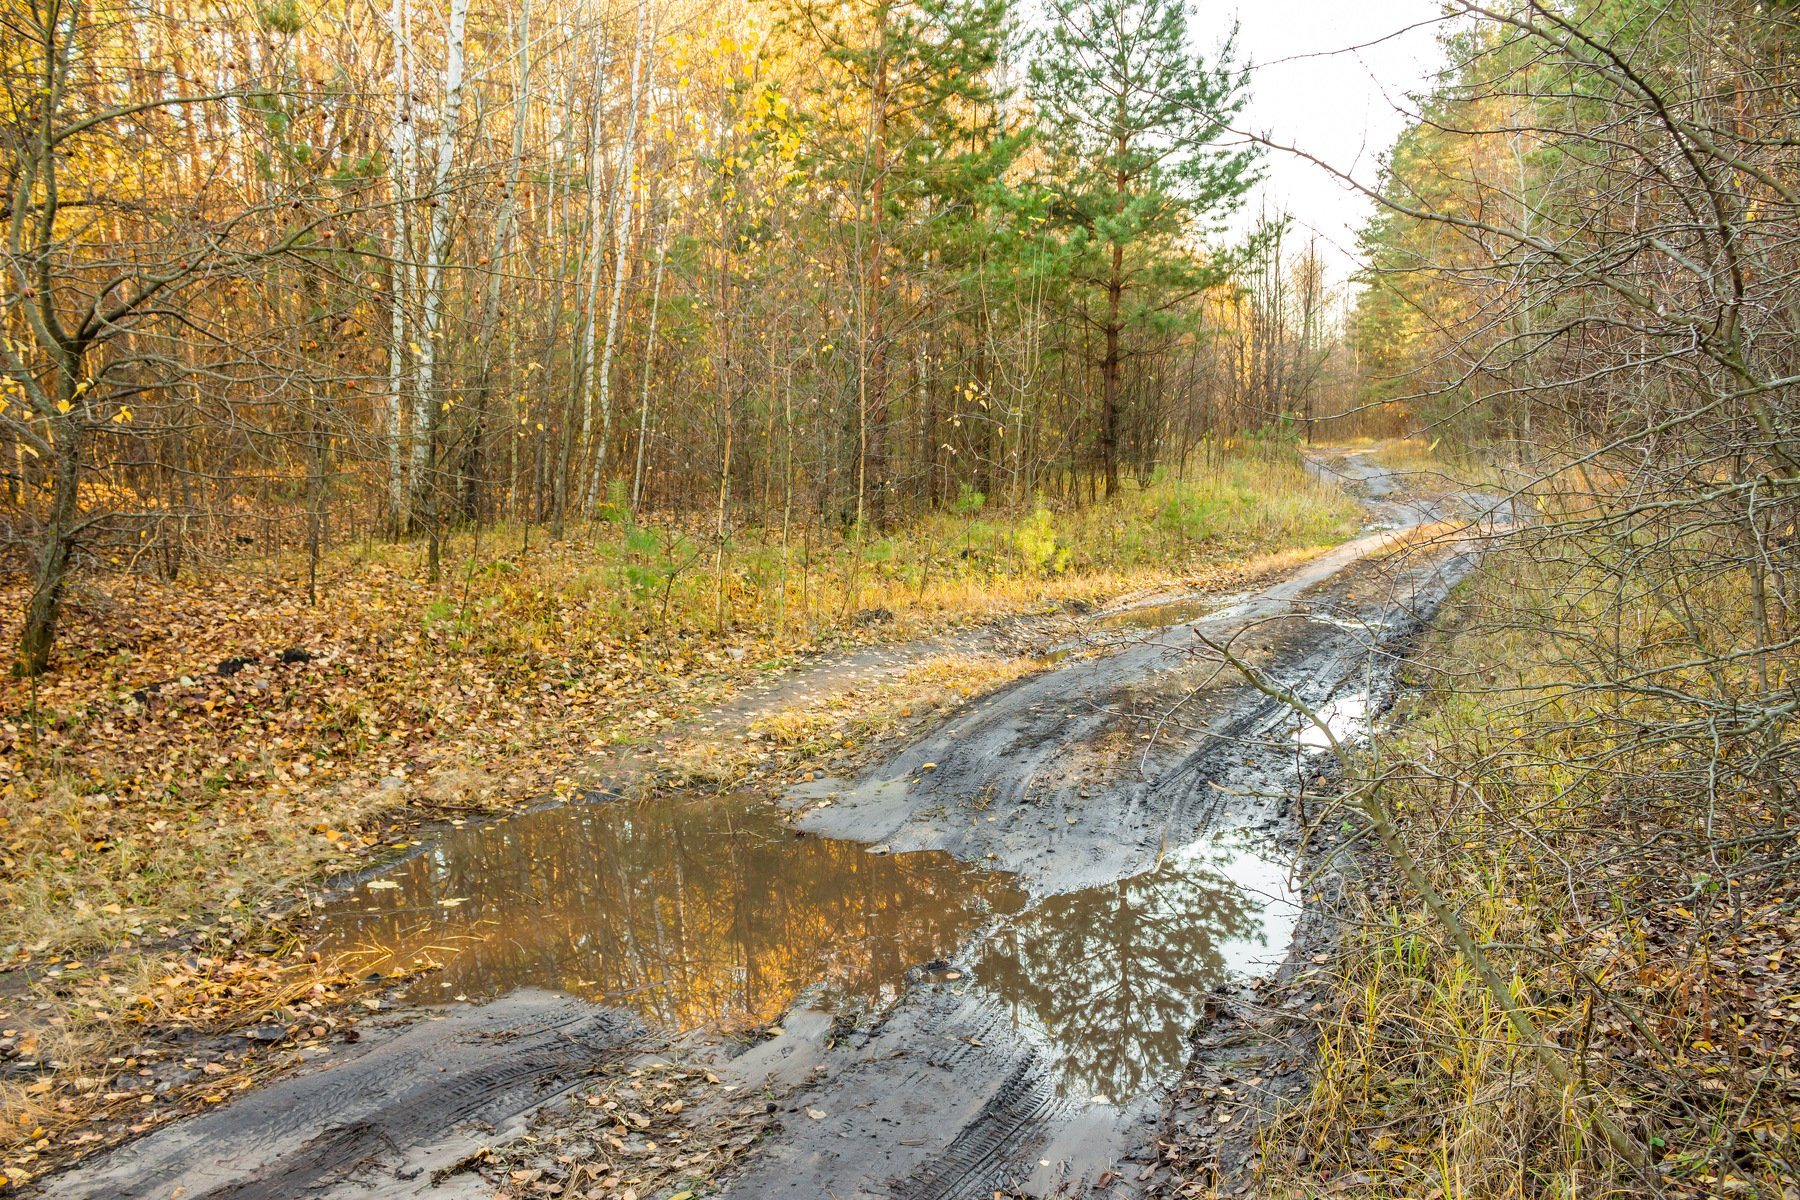 осень, октябрь, лужи, лес, заповедник, дорога, грязь, Руслан Востриков